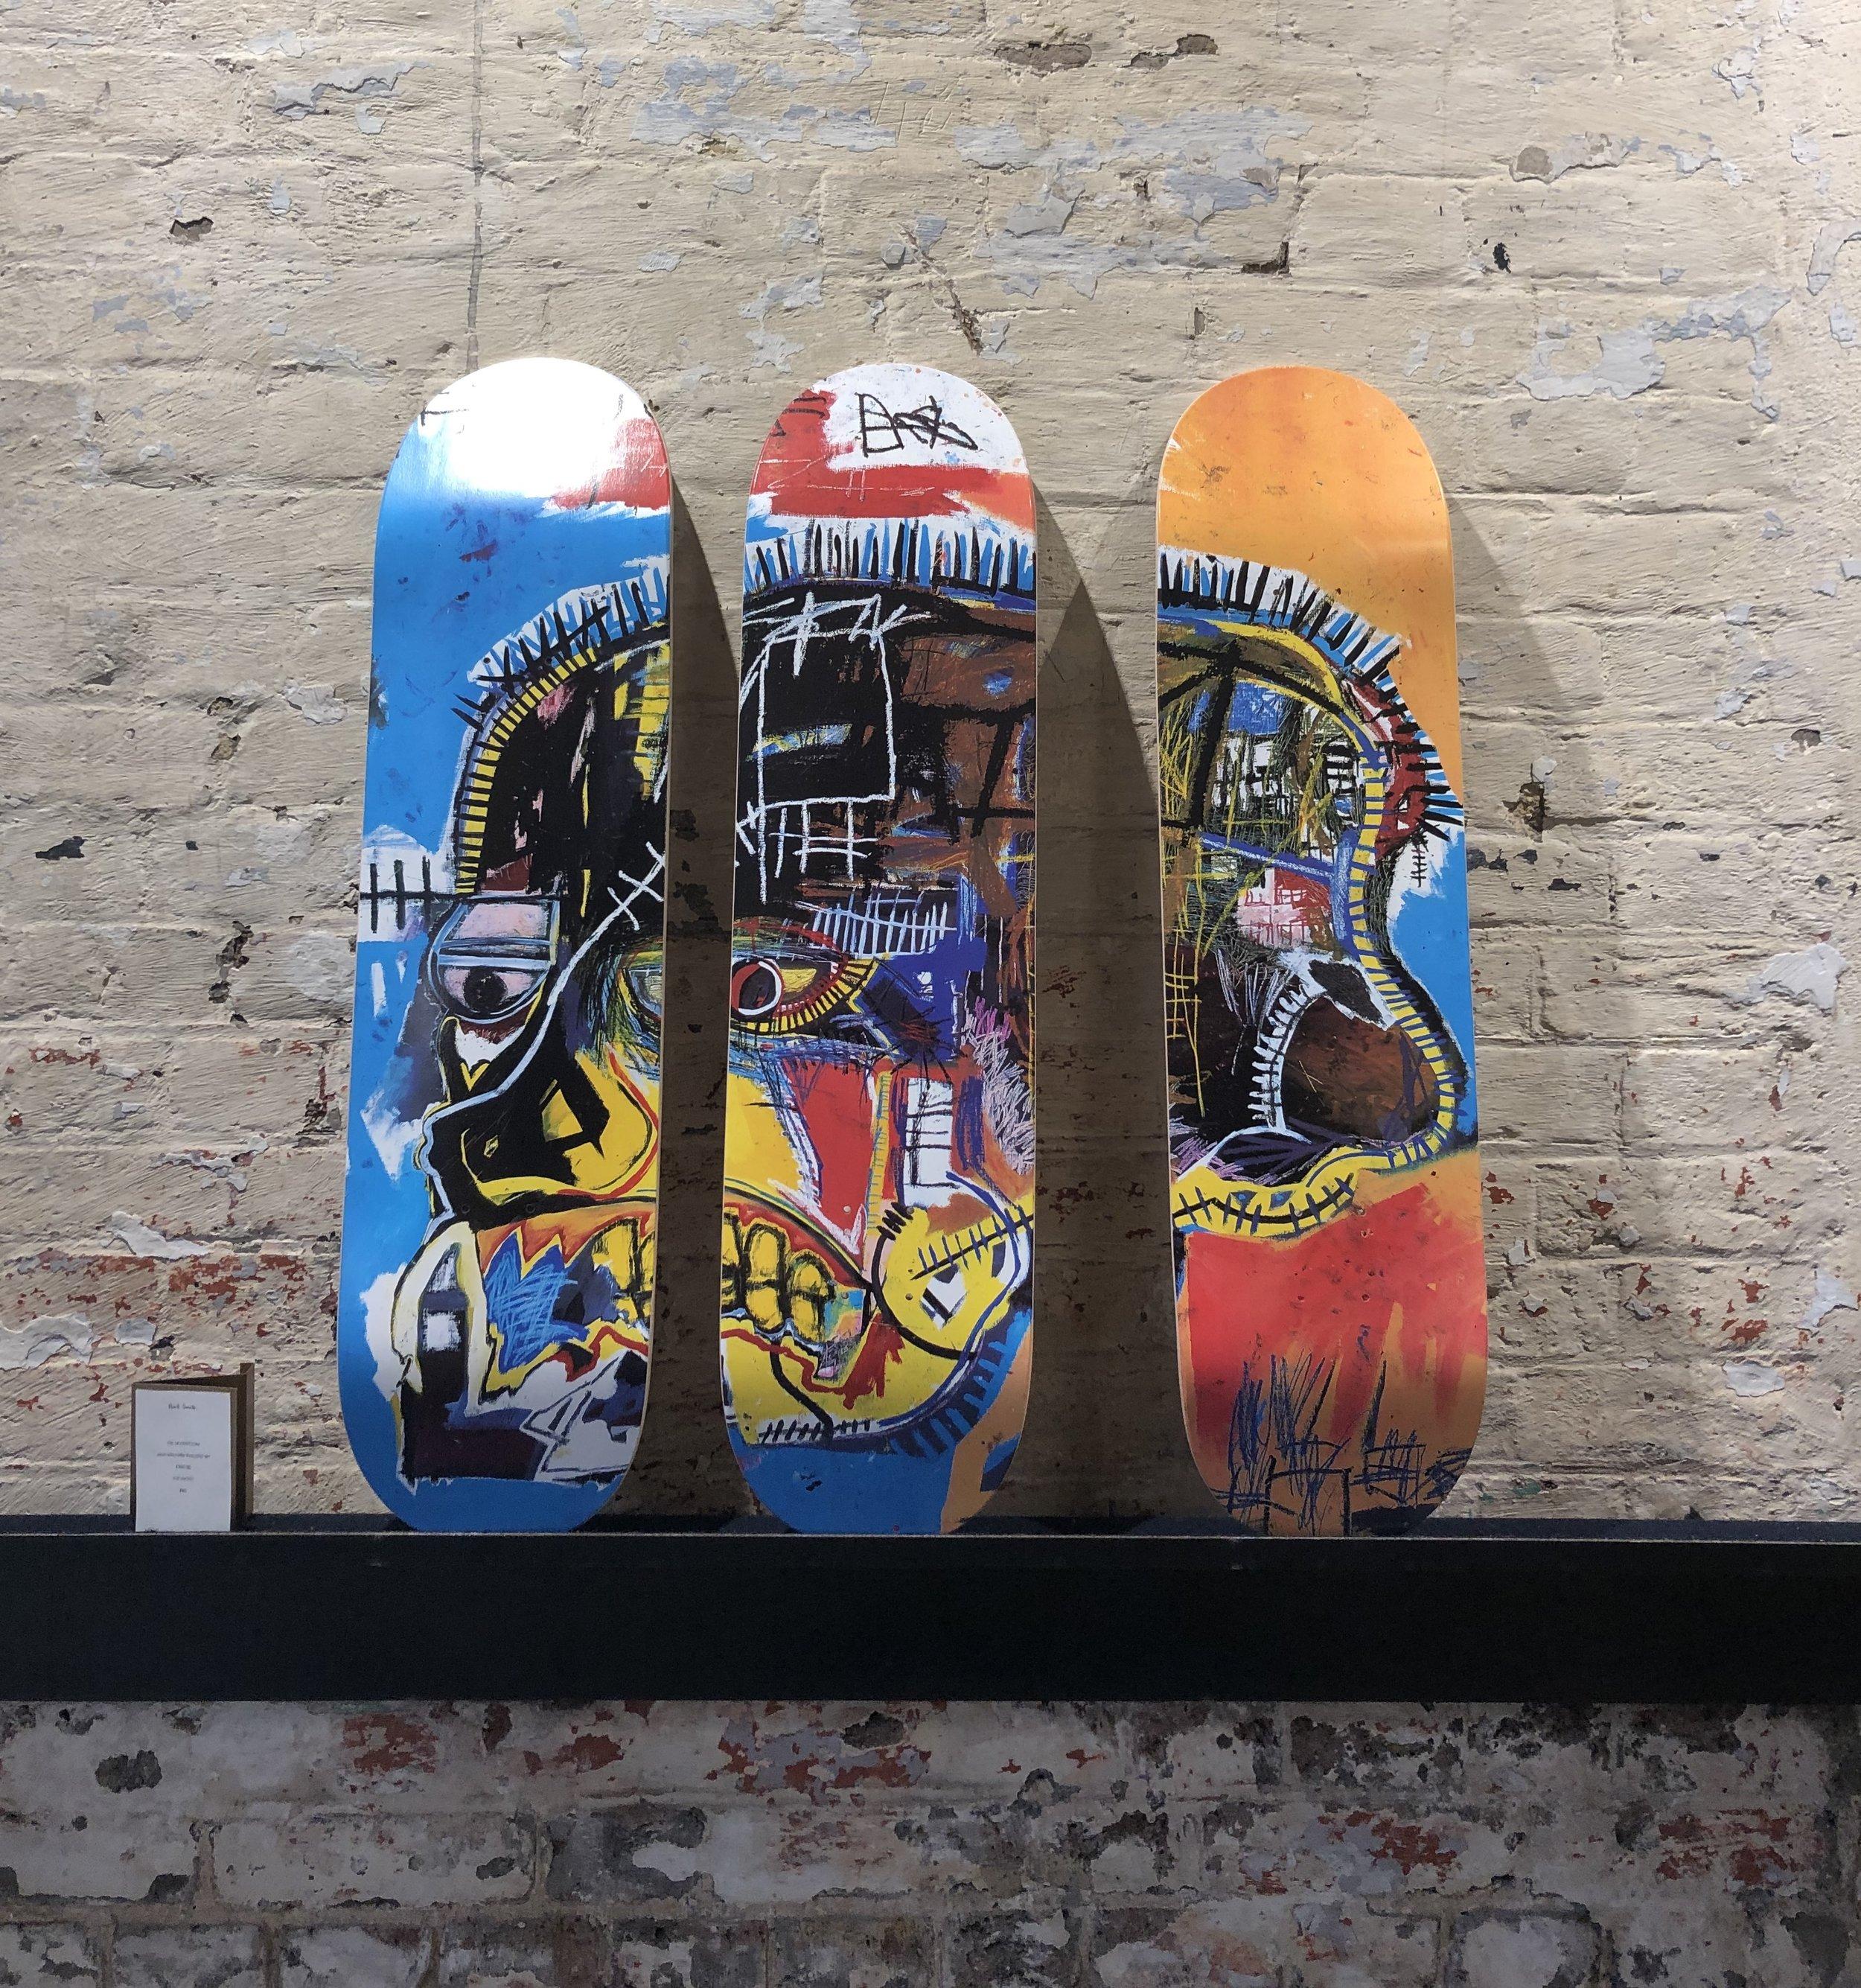 Basquiat skateboards from Paul Smith